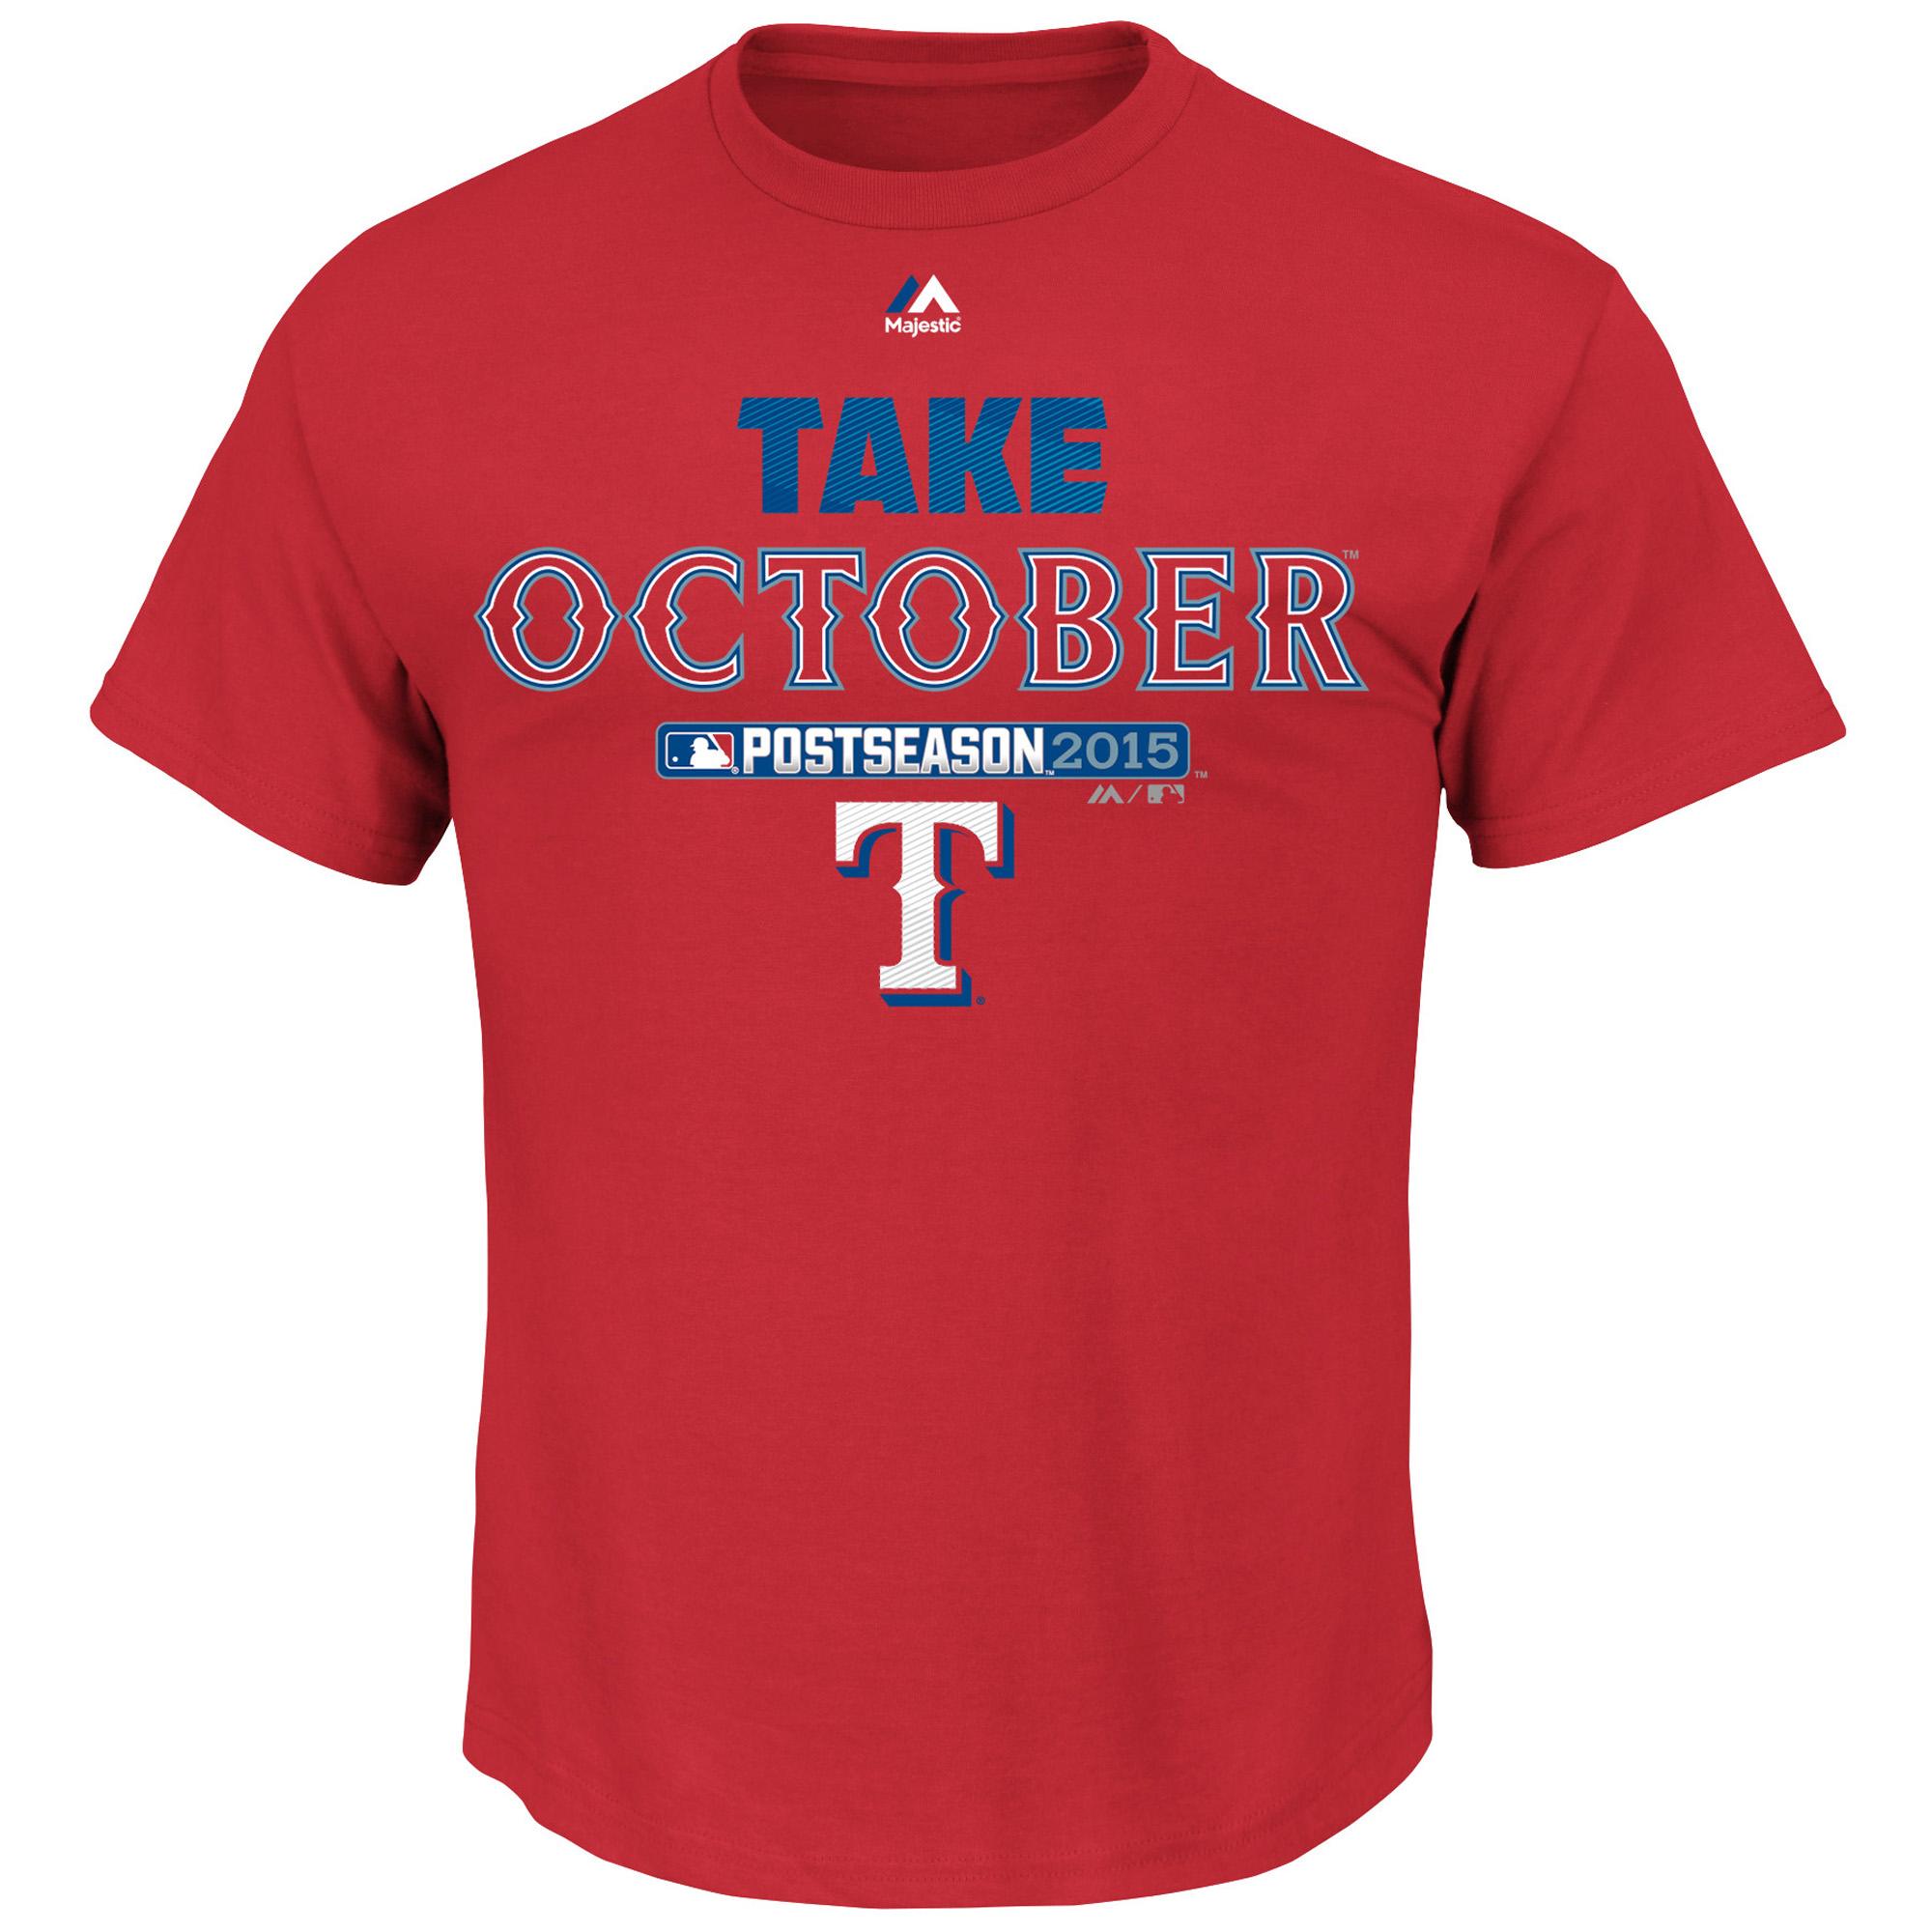 Texas Rangers Majestic 2015 Postseason Part T-Shirt - Red